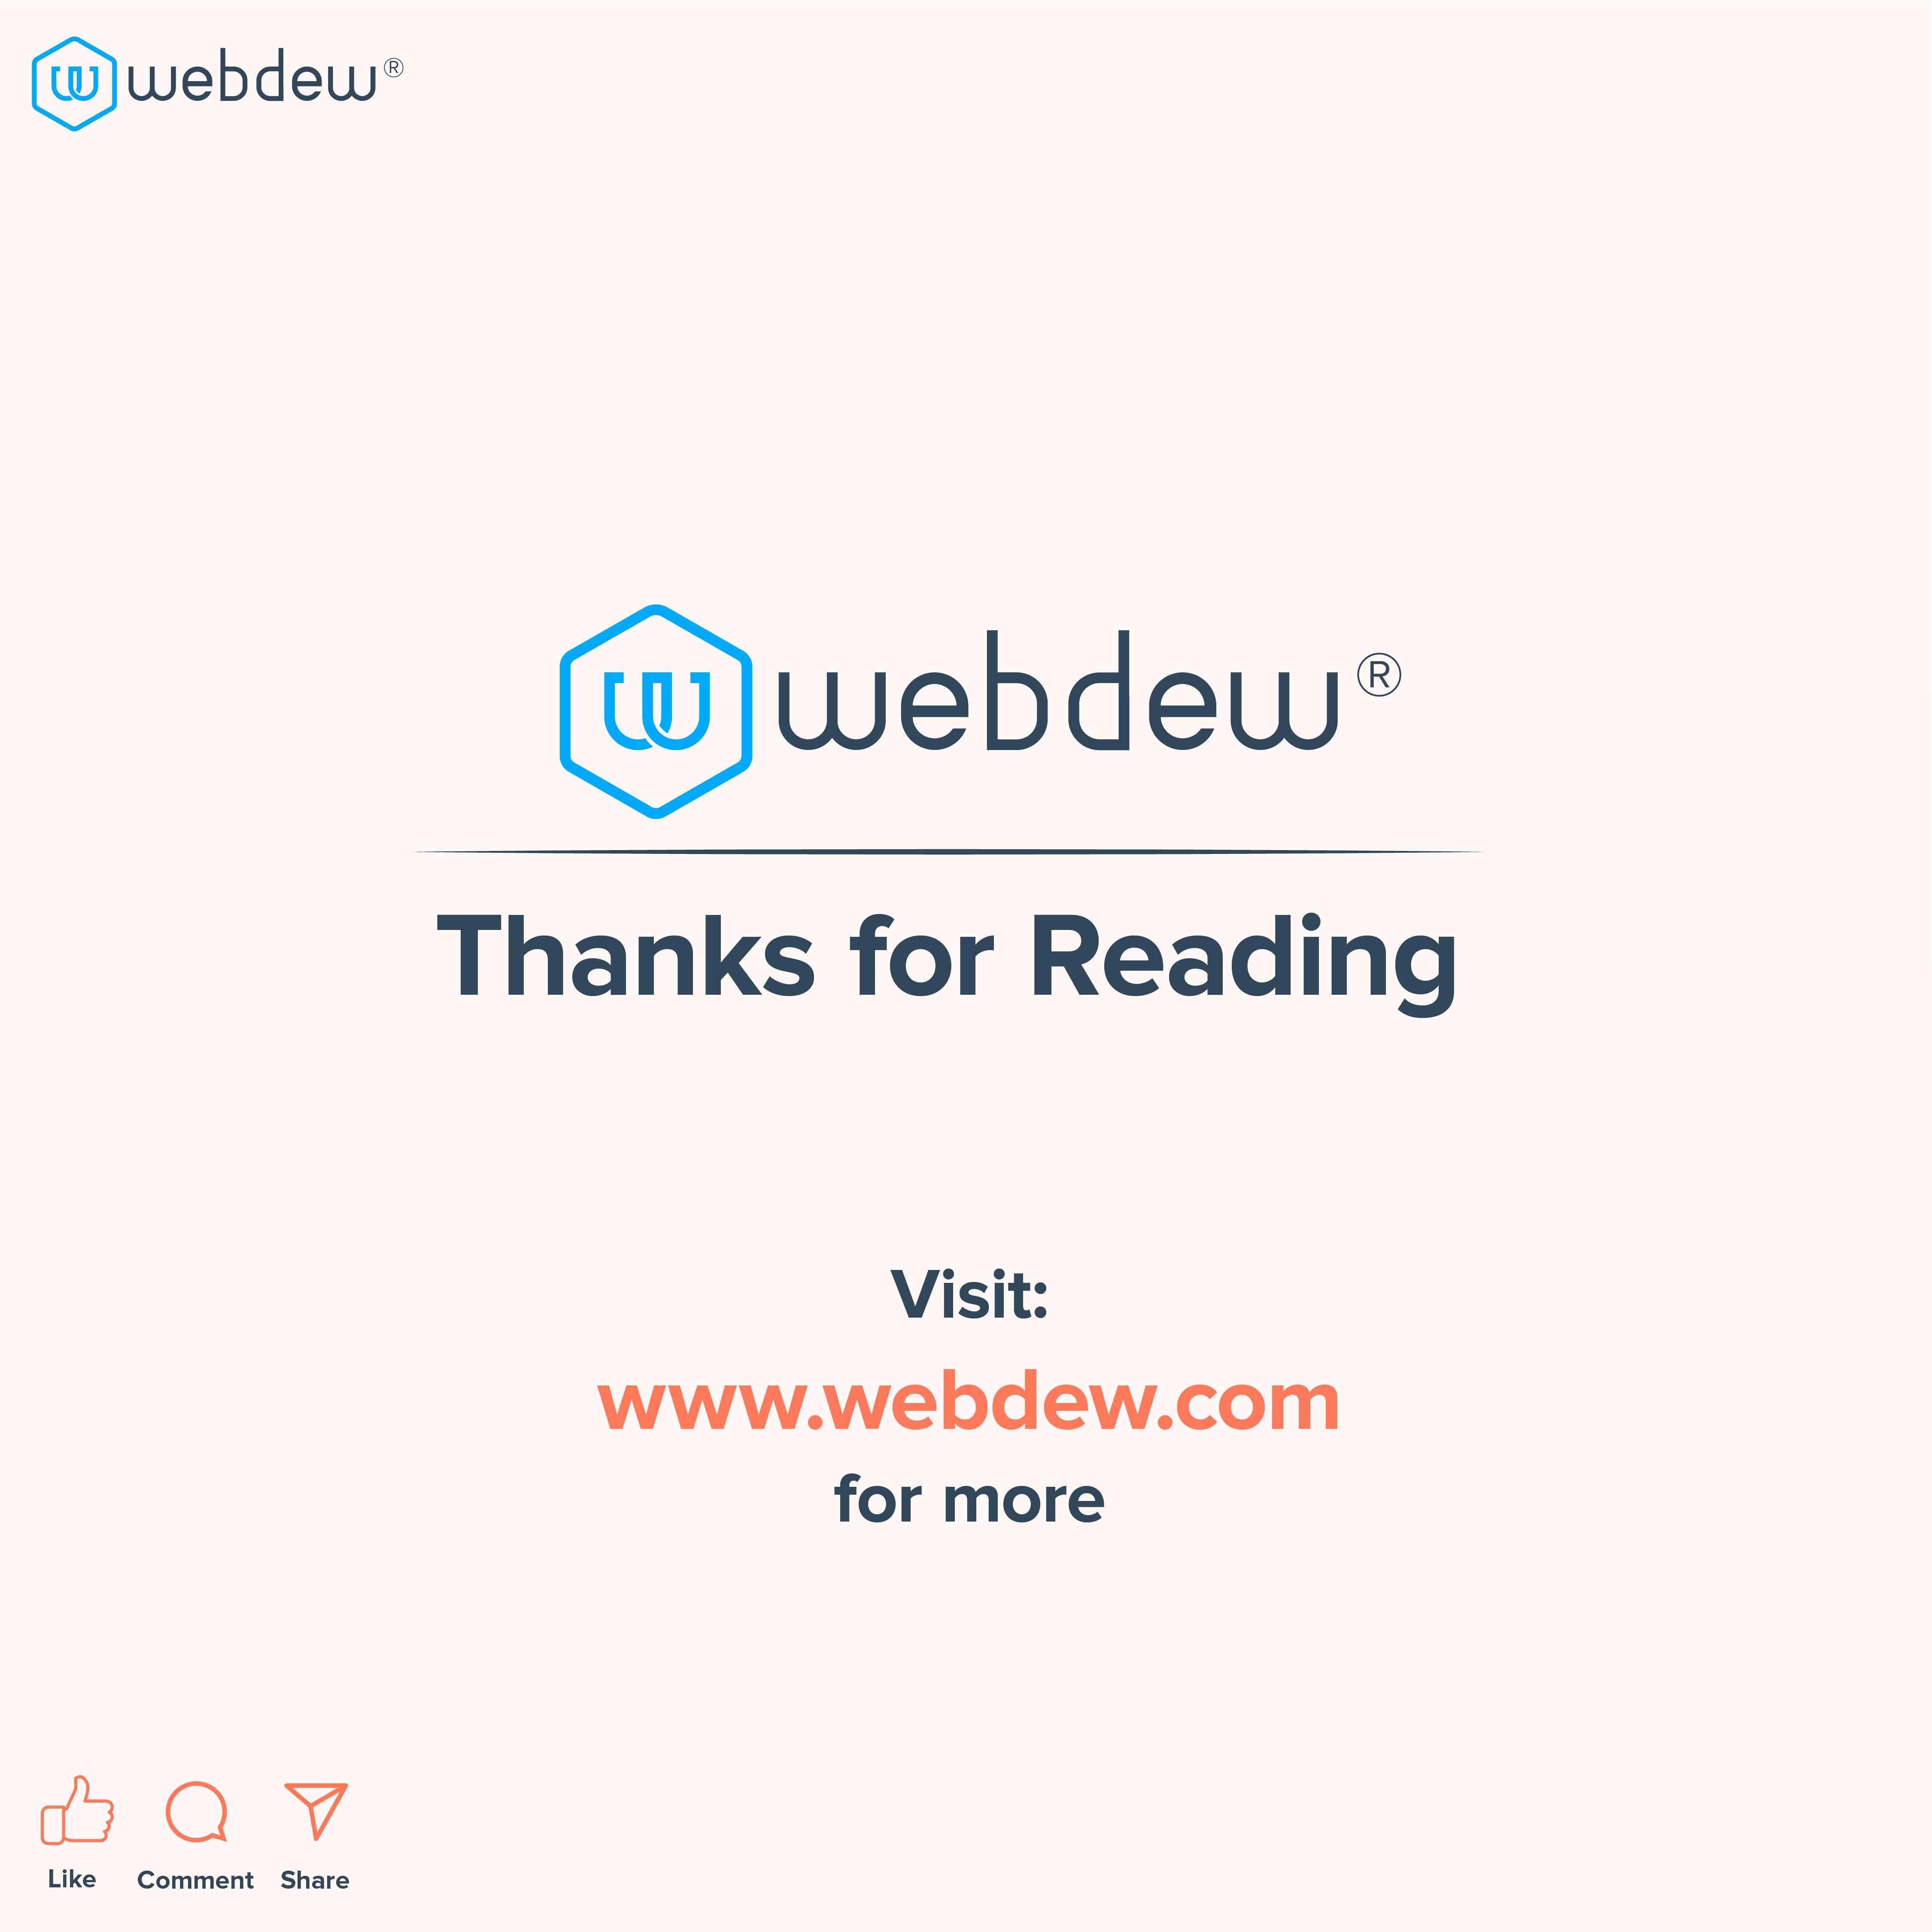 7. thanks for reading-1